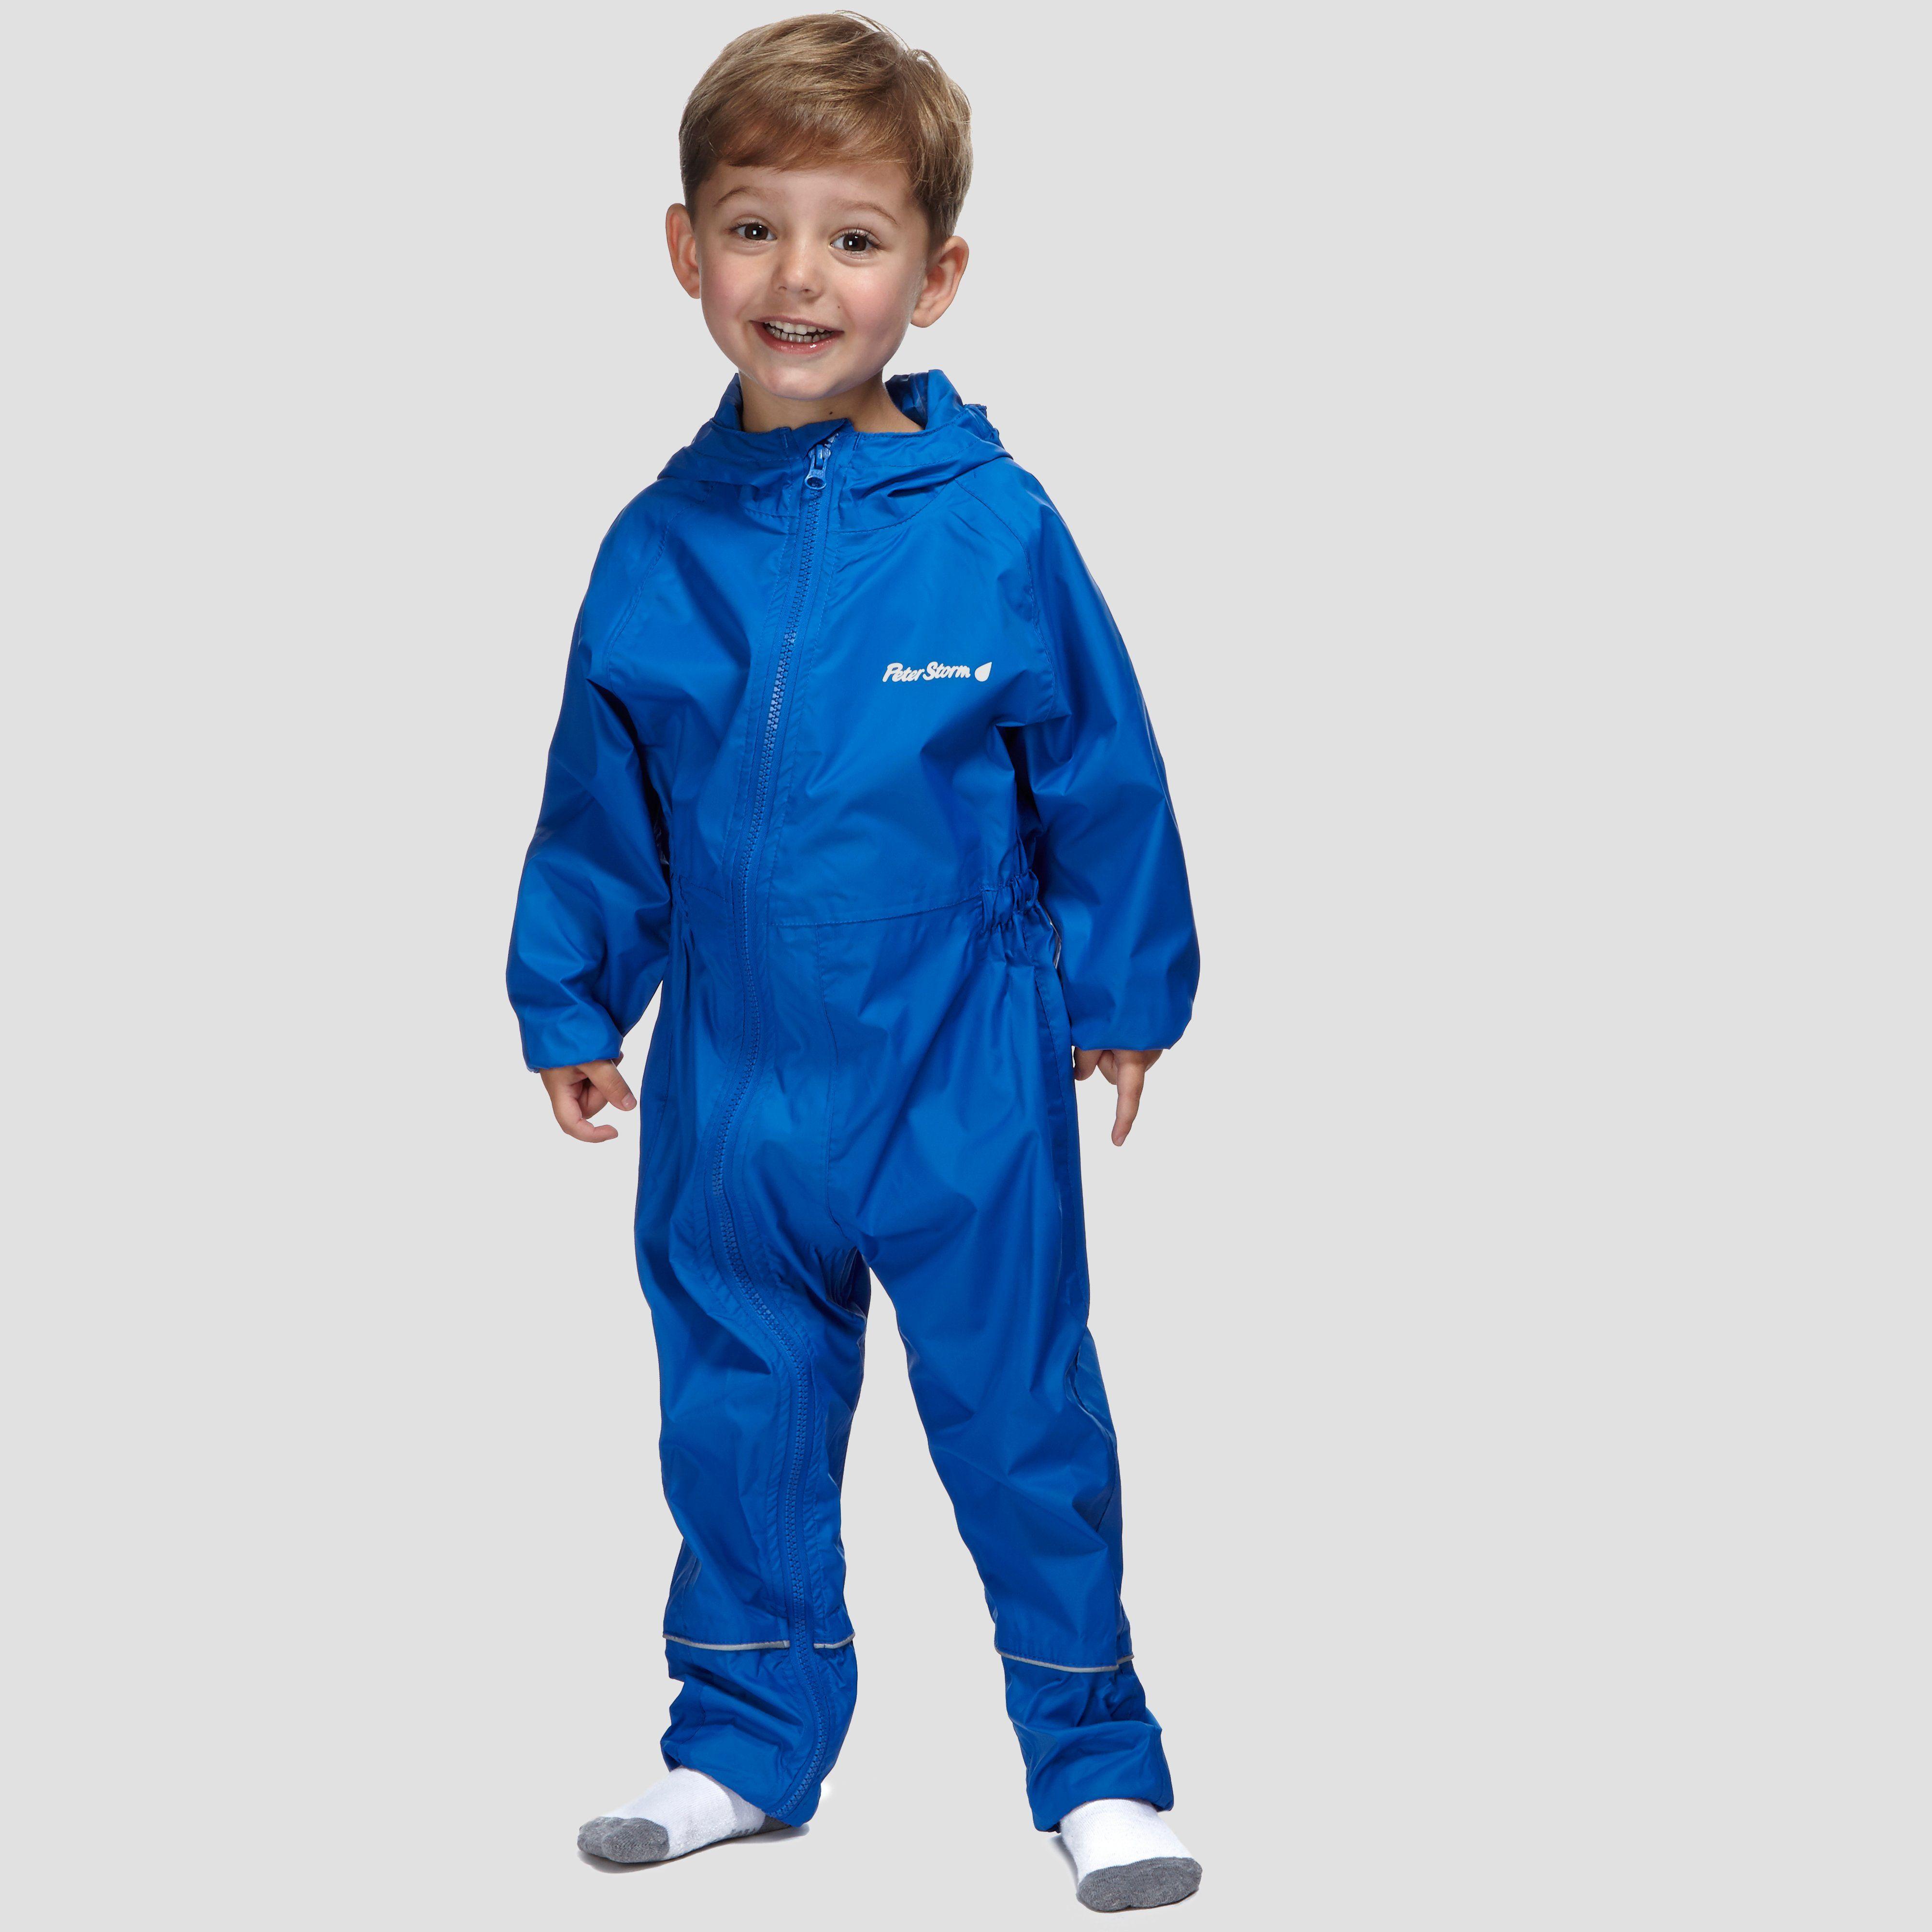 PETER STORM Boys' Waterproof Suit